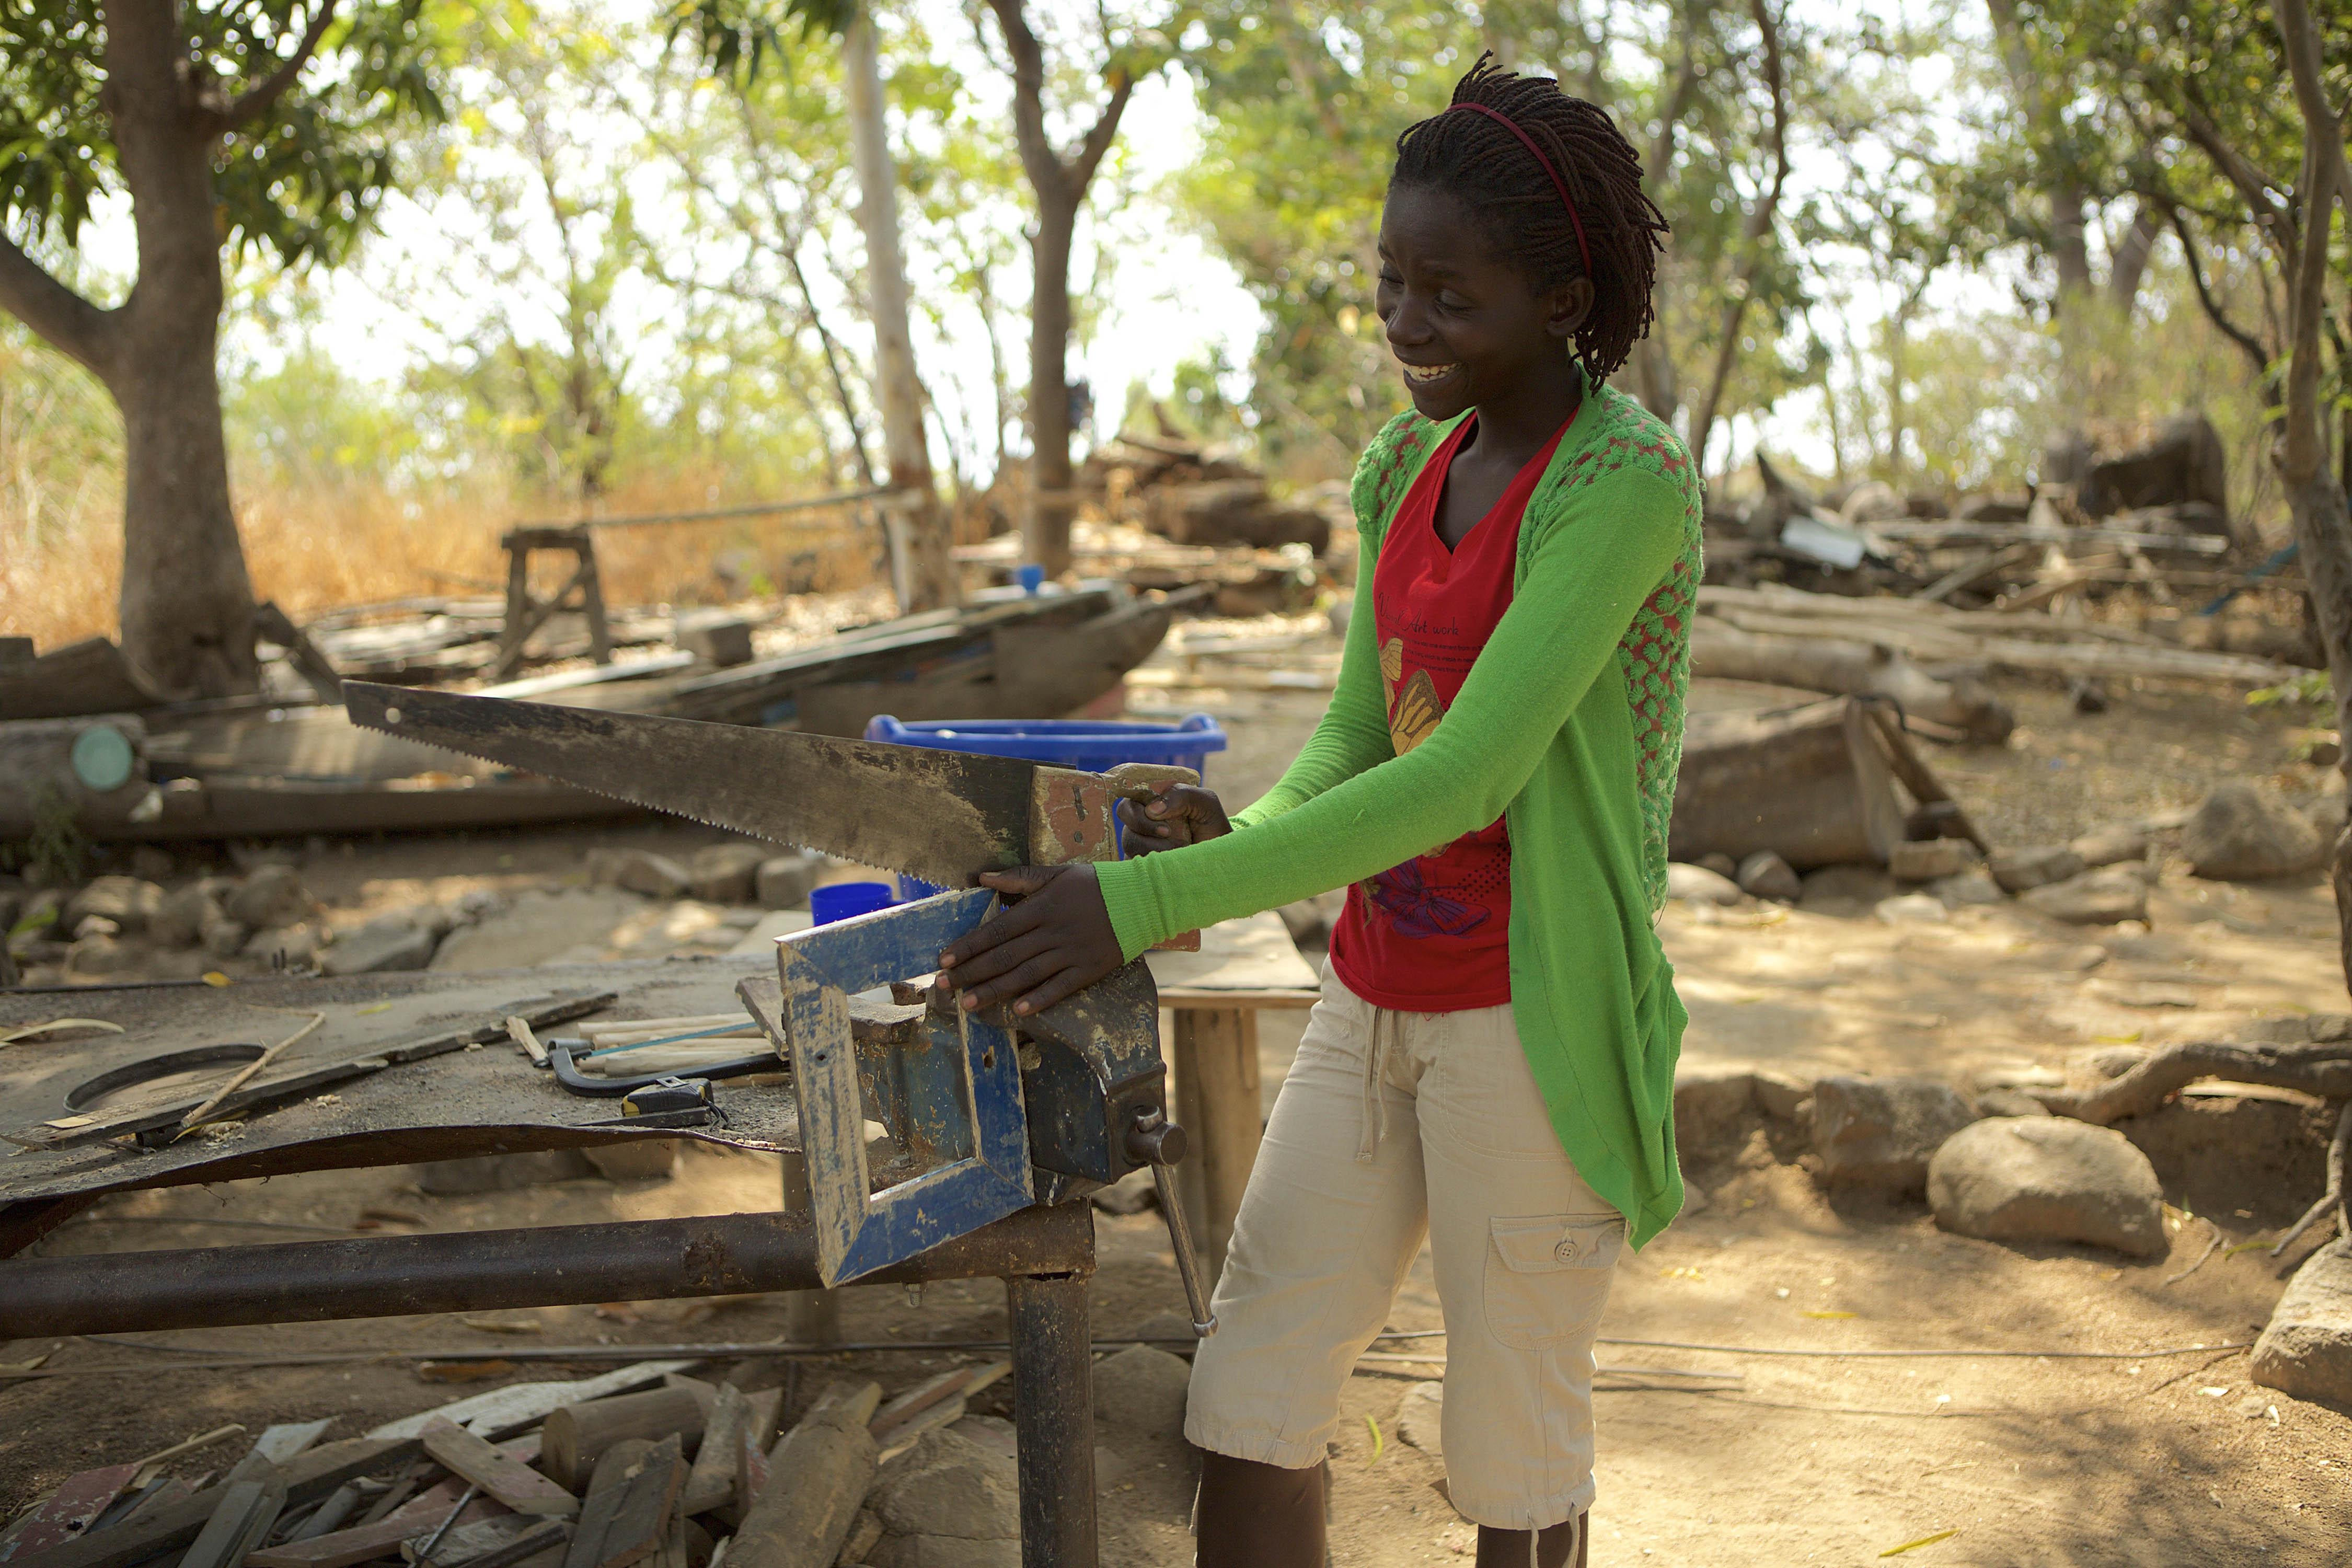 woman empowerment - faith carpentry